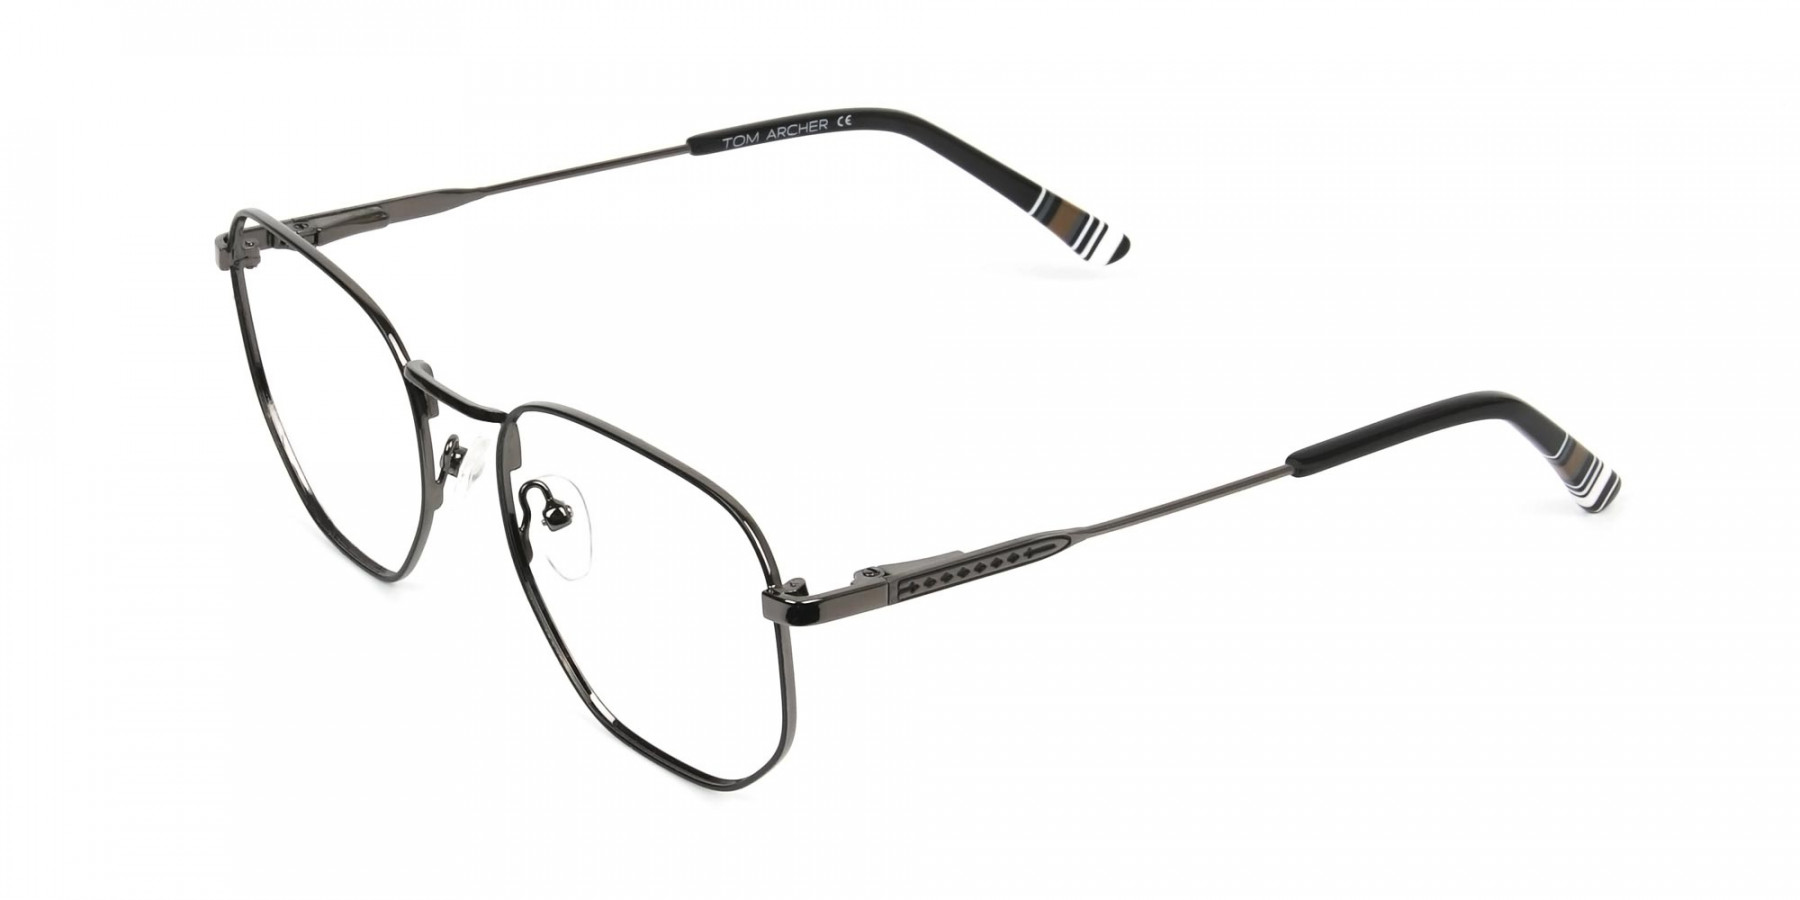 Wayfarer Geometric Gunmetal Black Spectacles - 1